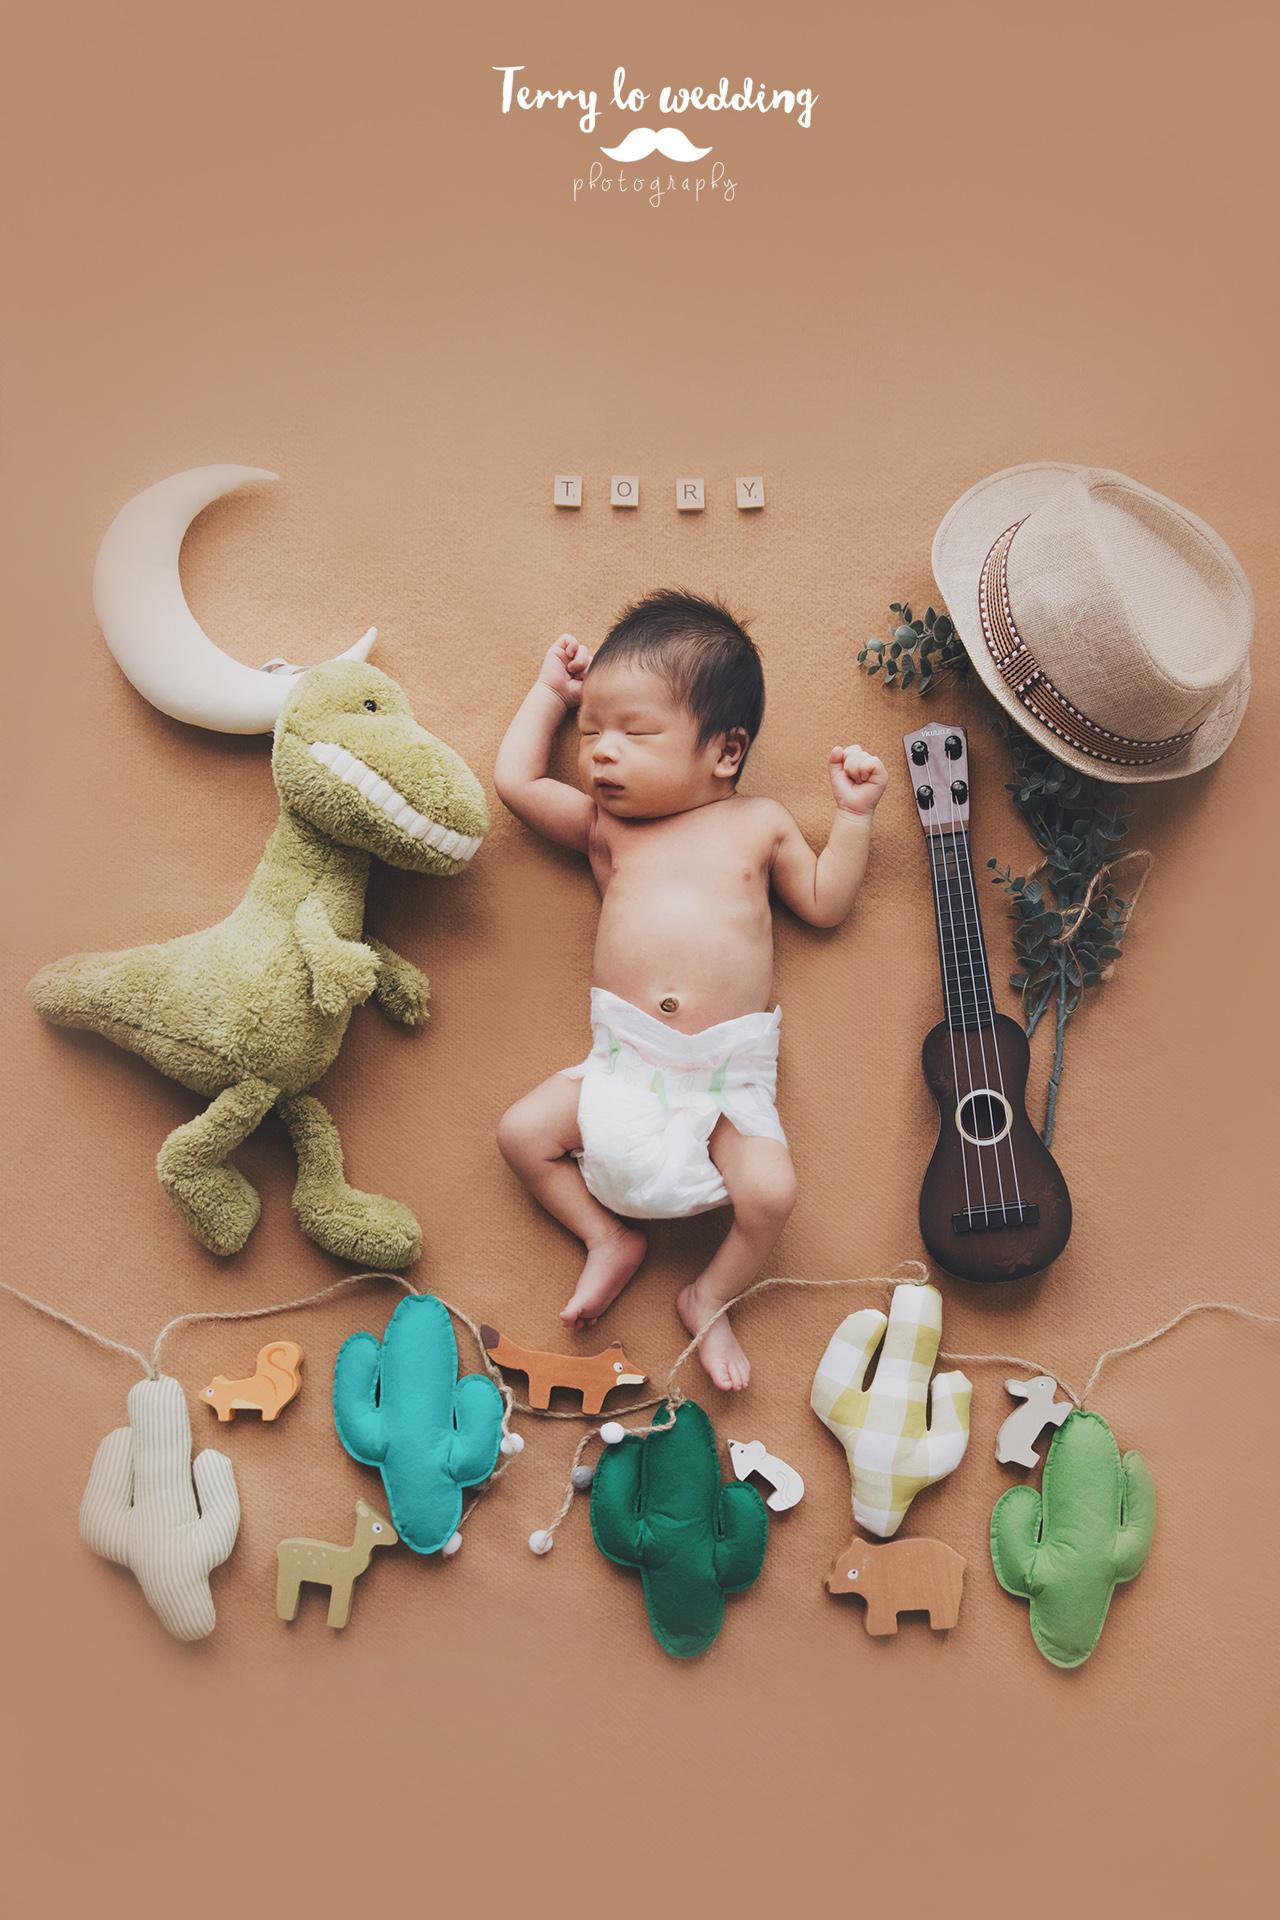 newborn_Tory_1920_02